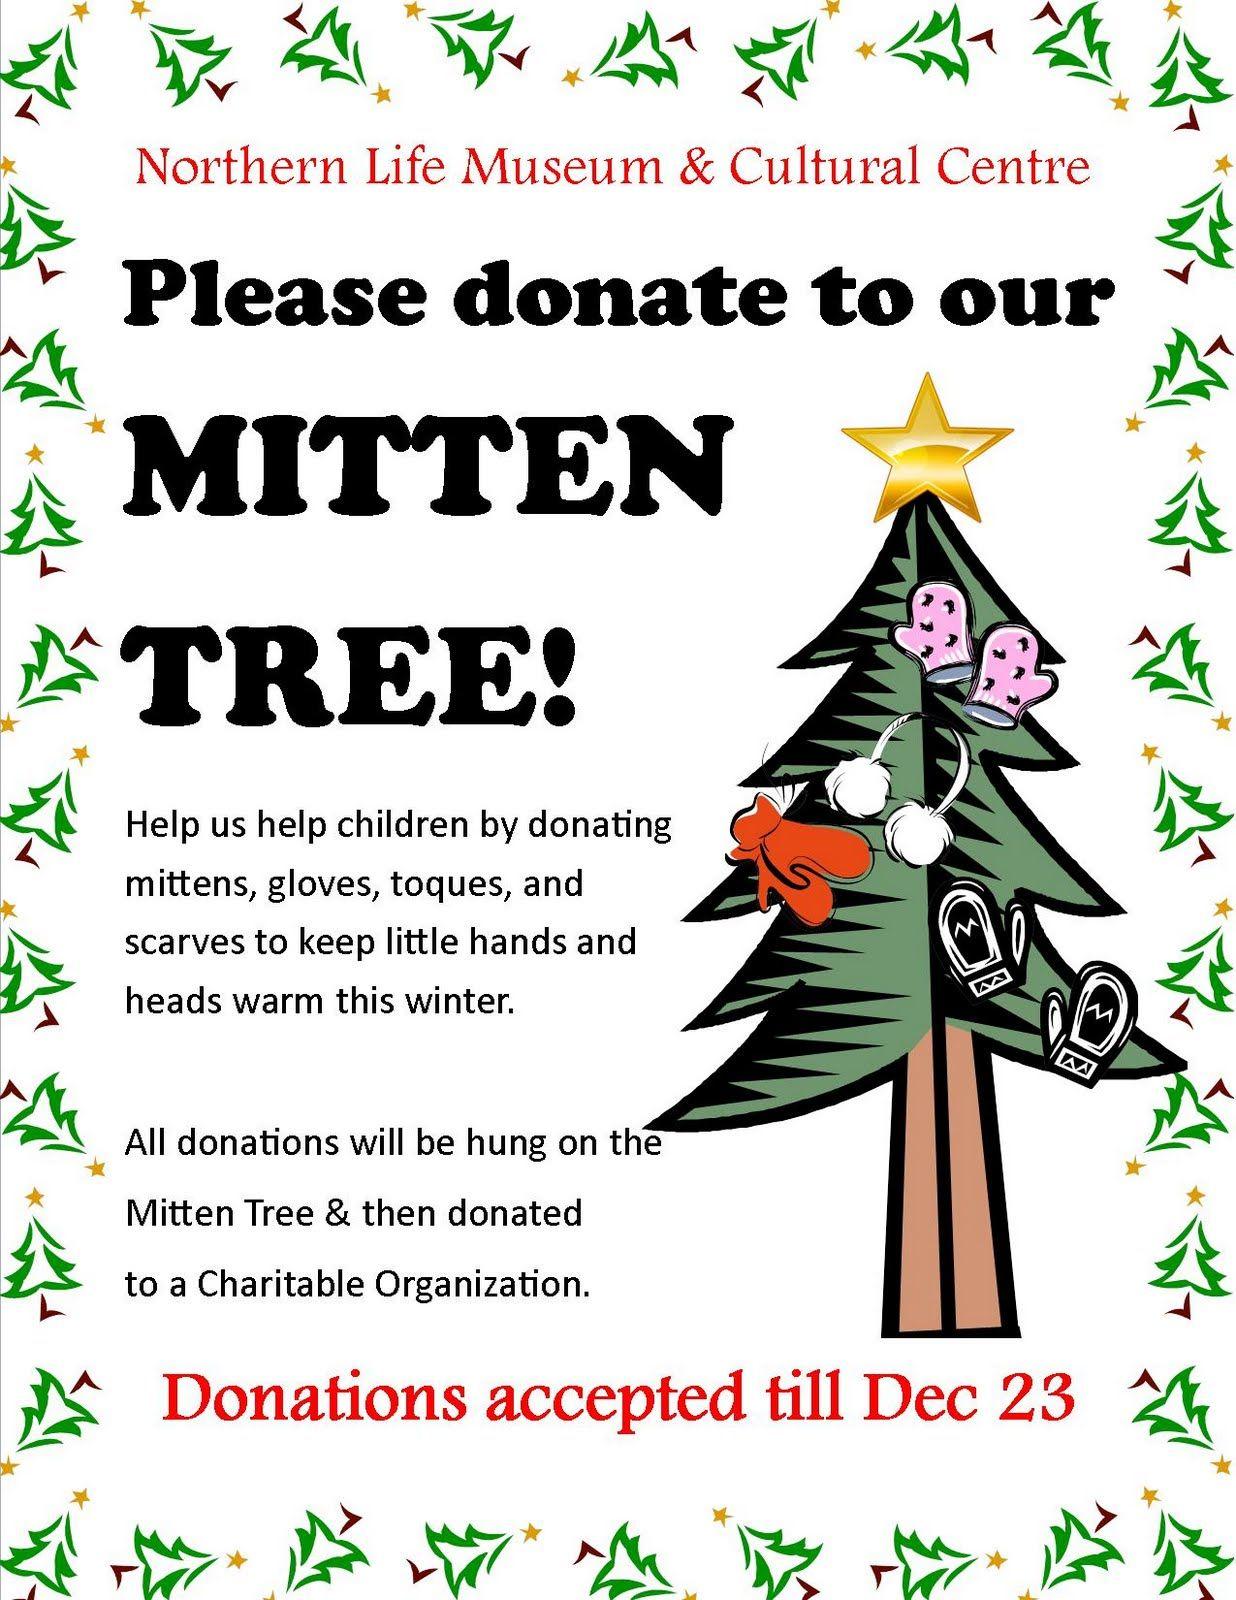 mitten tree donations Happy Holidays Everyone